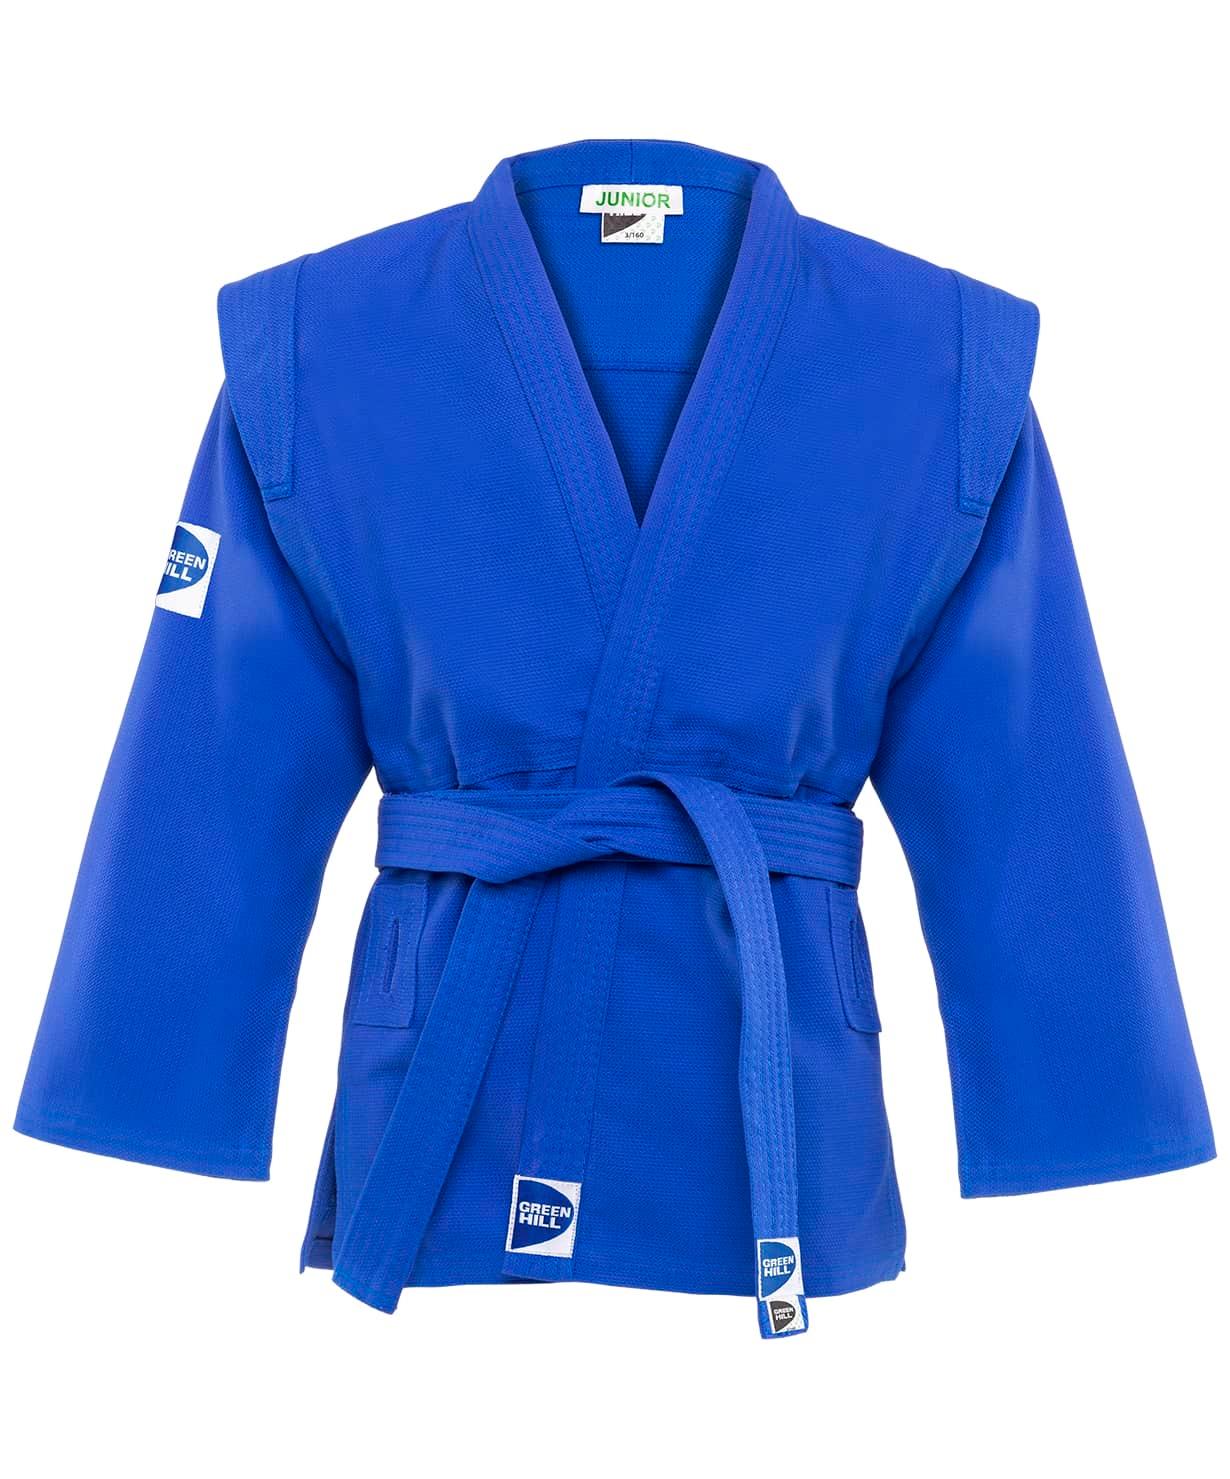 Куртка для самбо Junior SCJ-2201, синий, р.5/180